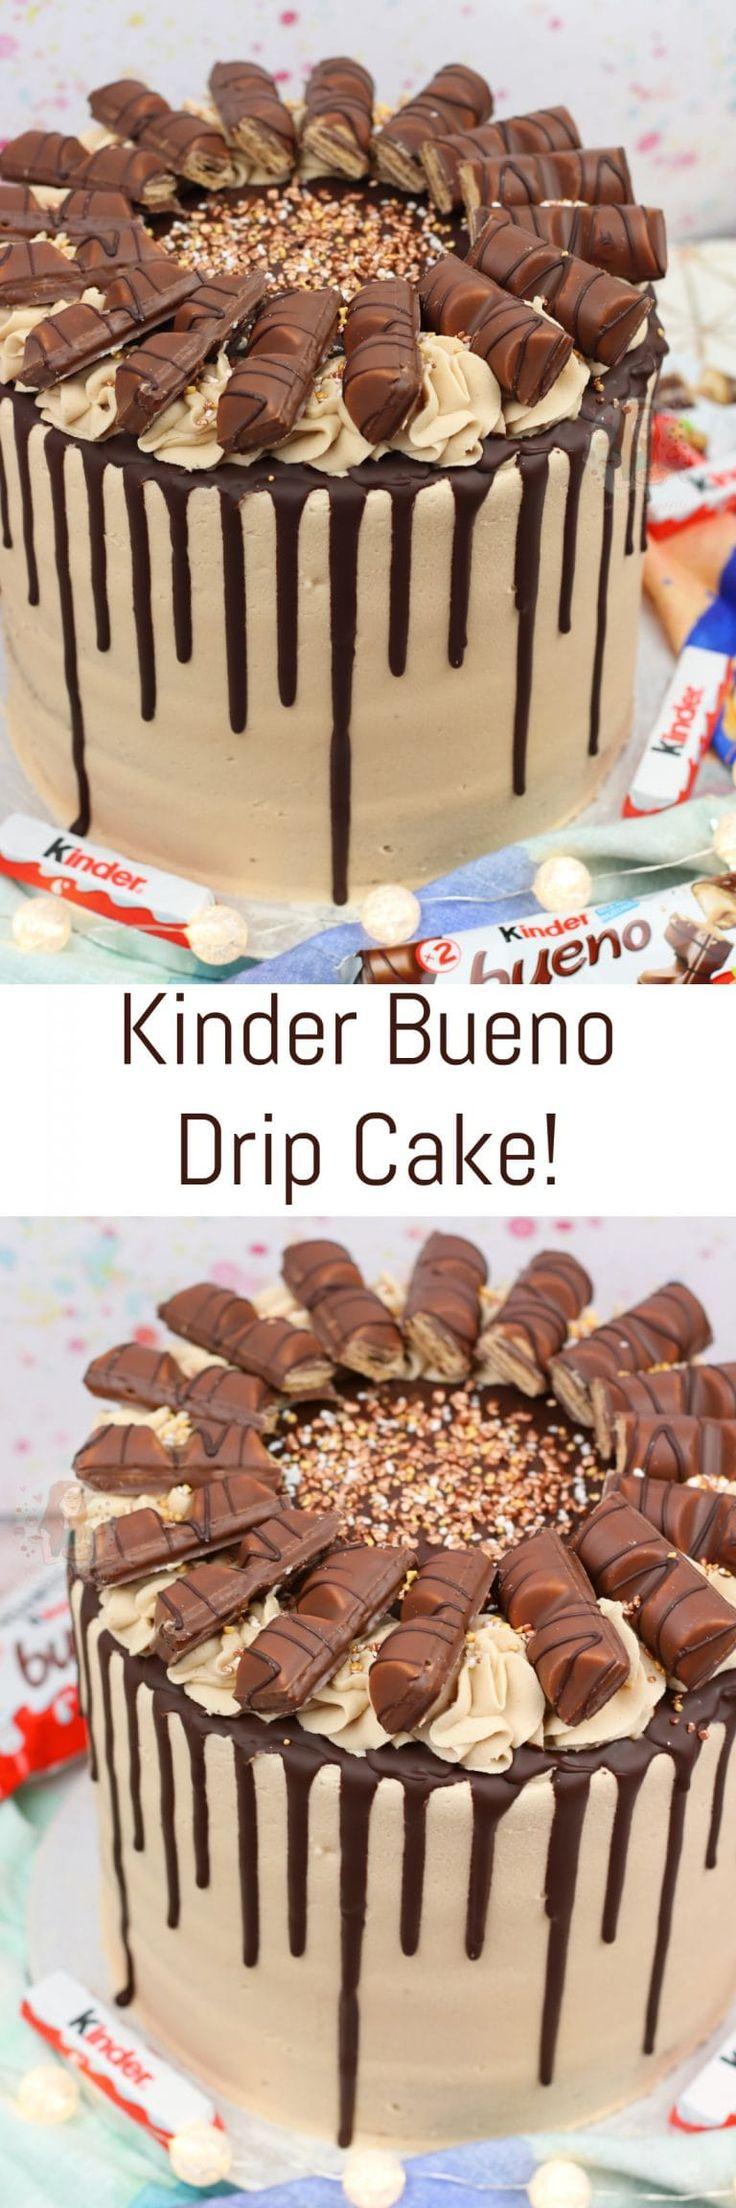 Kinder Bueno Drip Cake! – Jane's Patisserie – Recepies